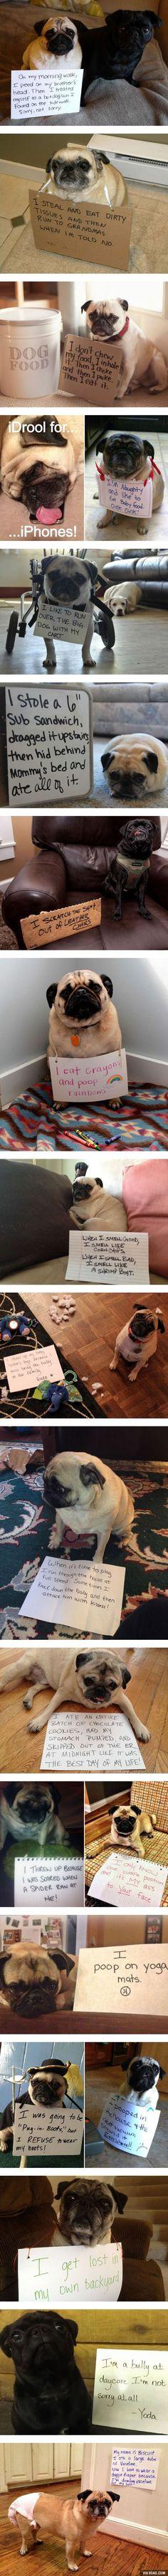 dog shaming - pug compilation